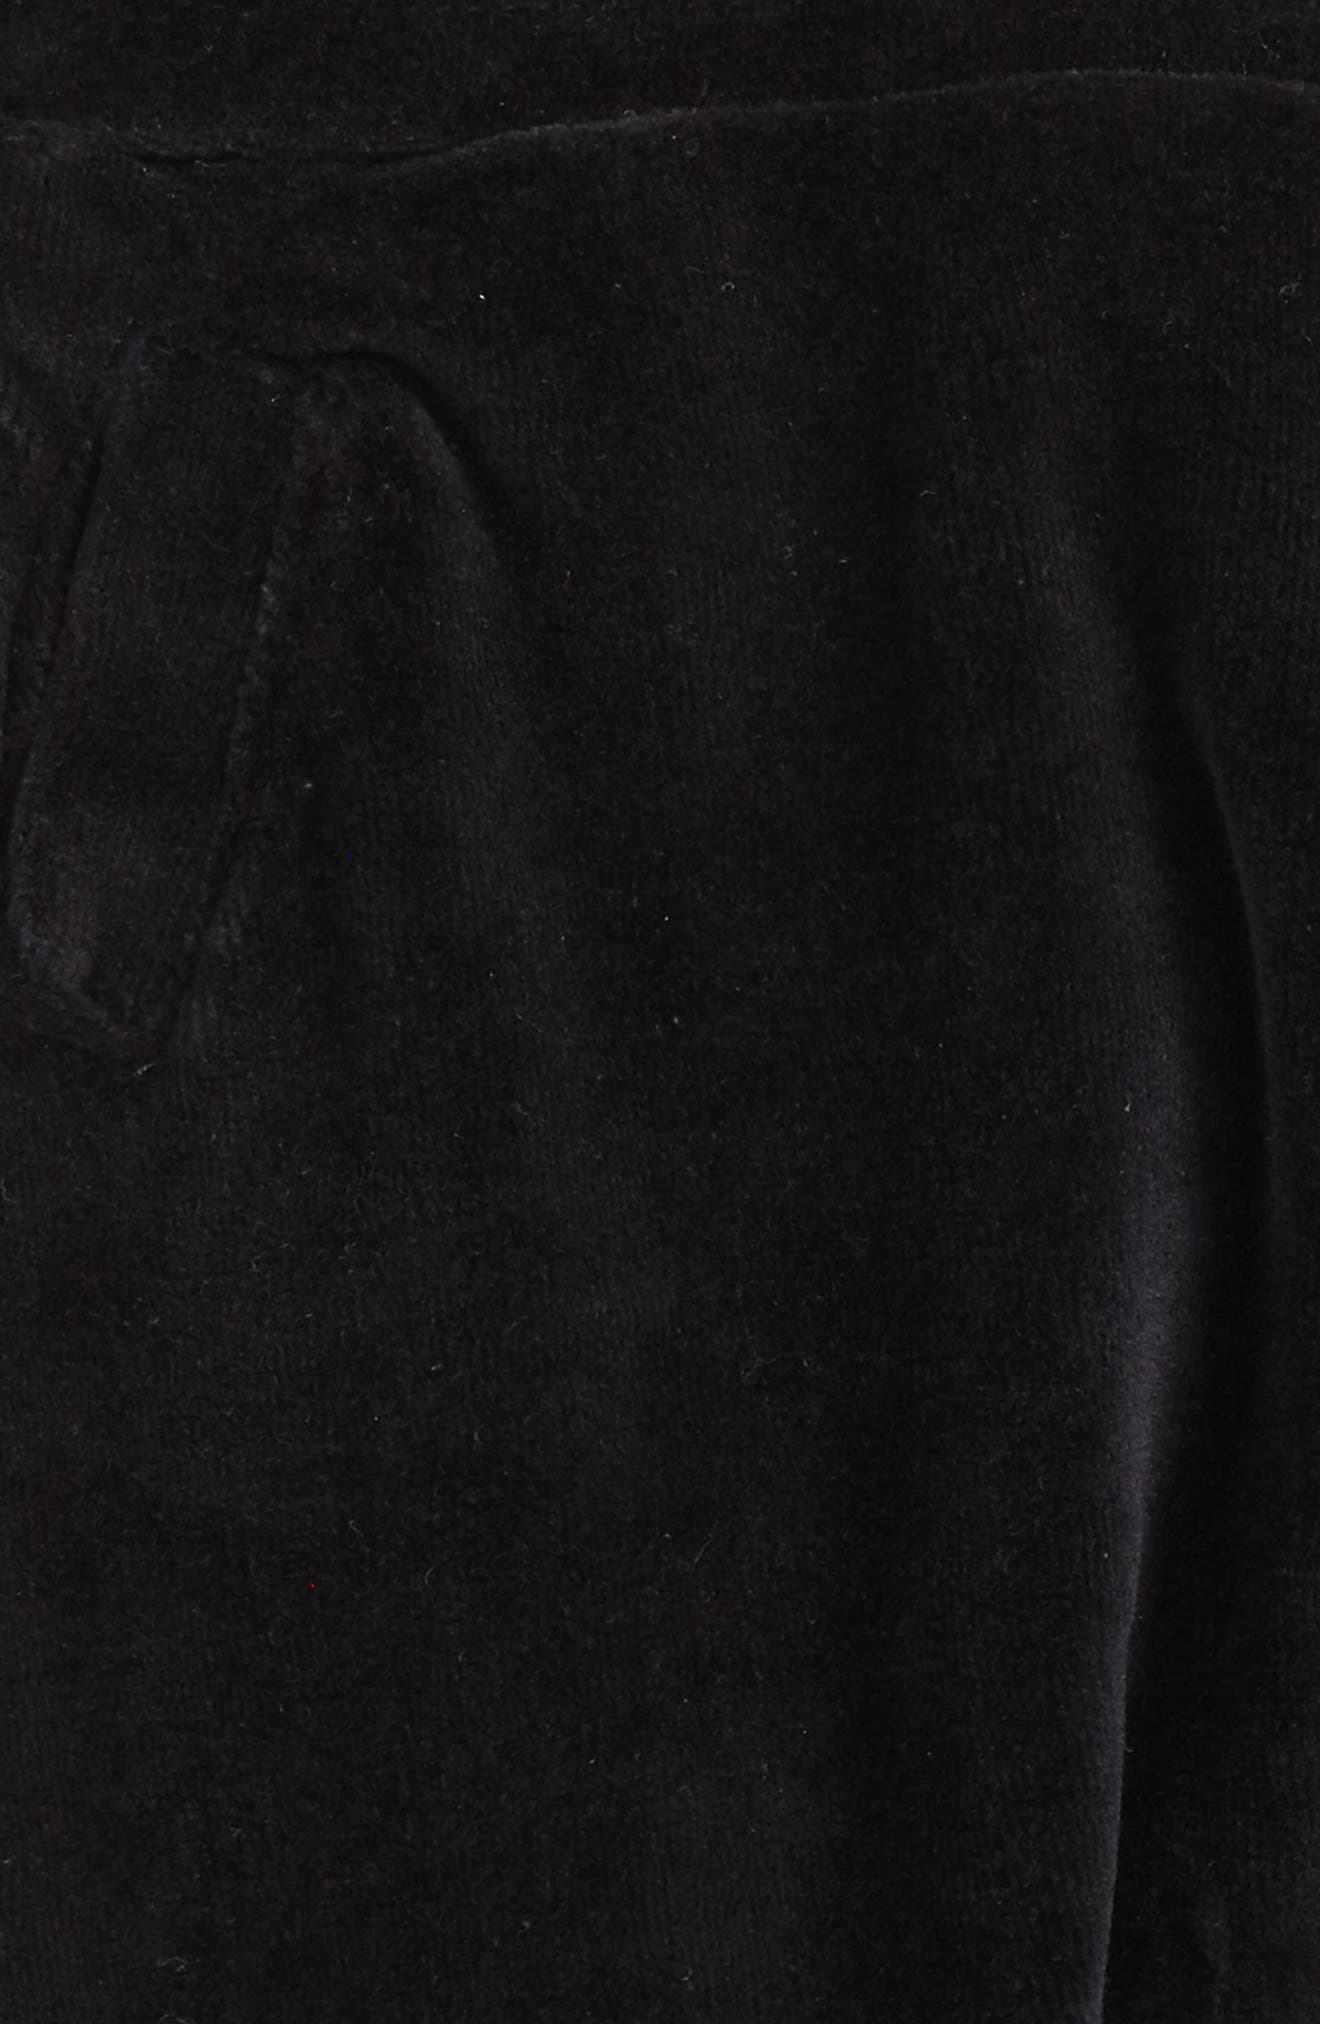 Velour Sweatpants,                             Alternate thumbnail 2, color,                             Black